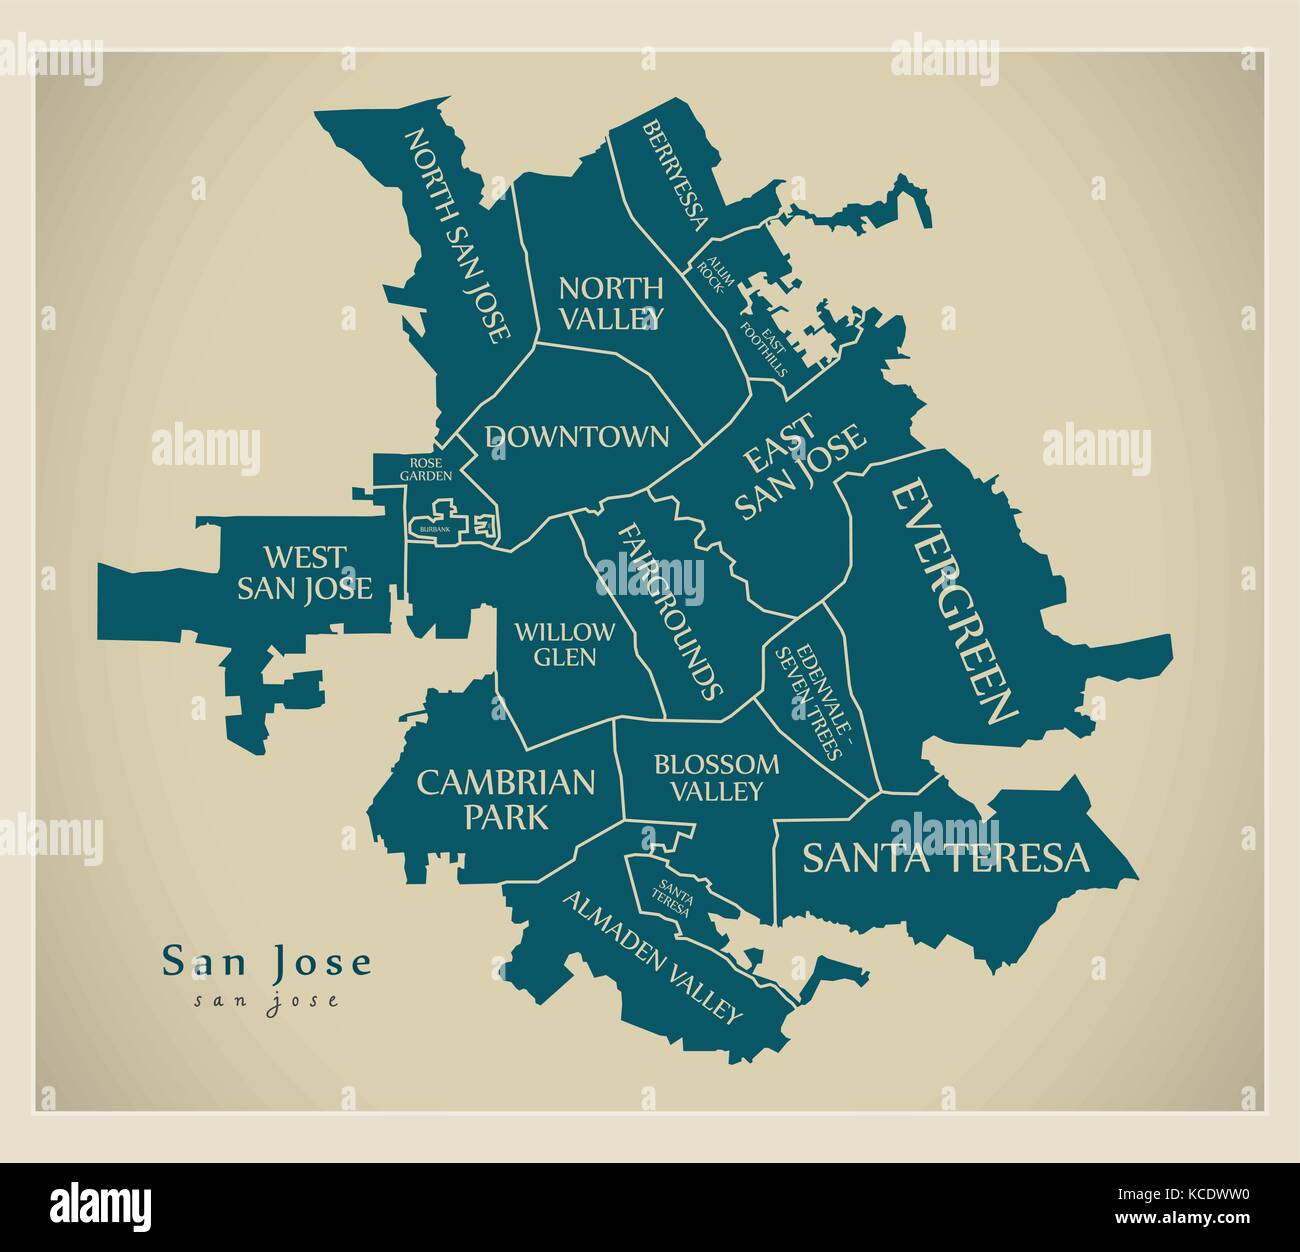 Modern City Map - San Jose city of the USA with neighborhoods and ...